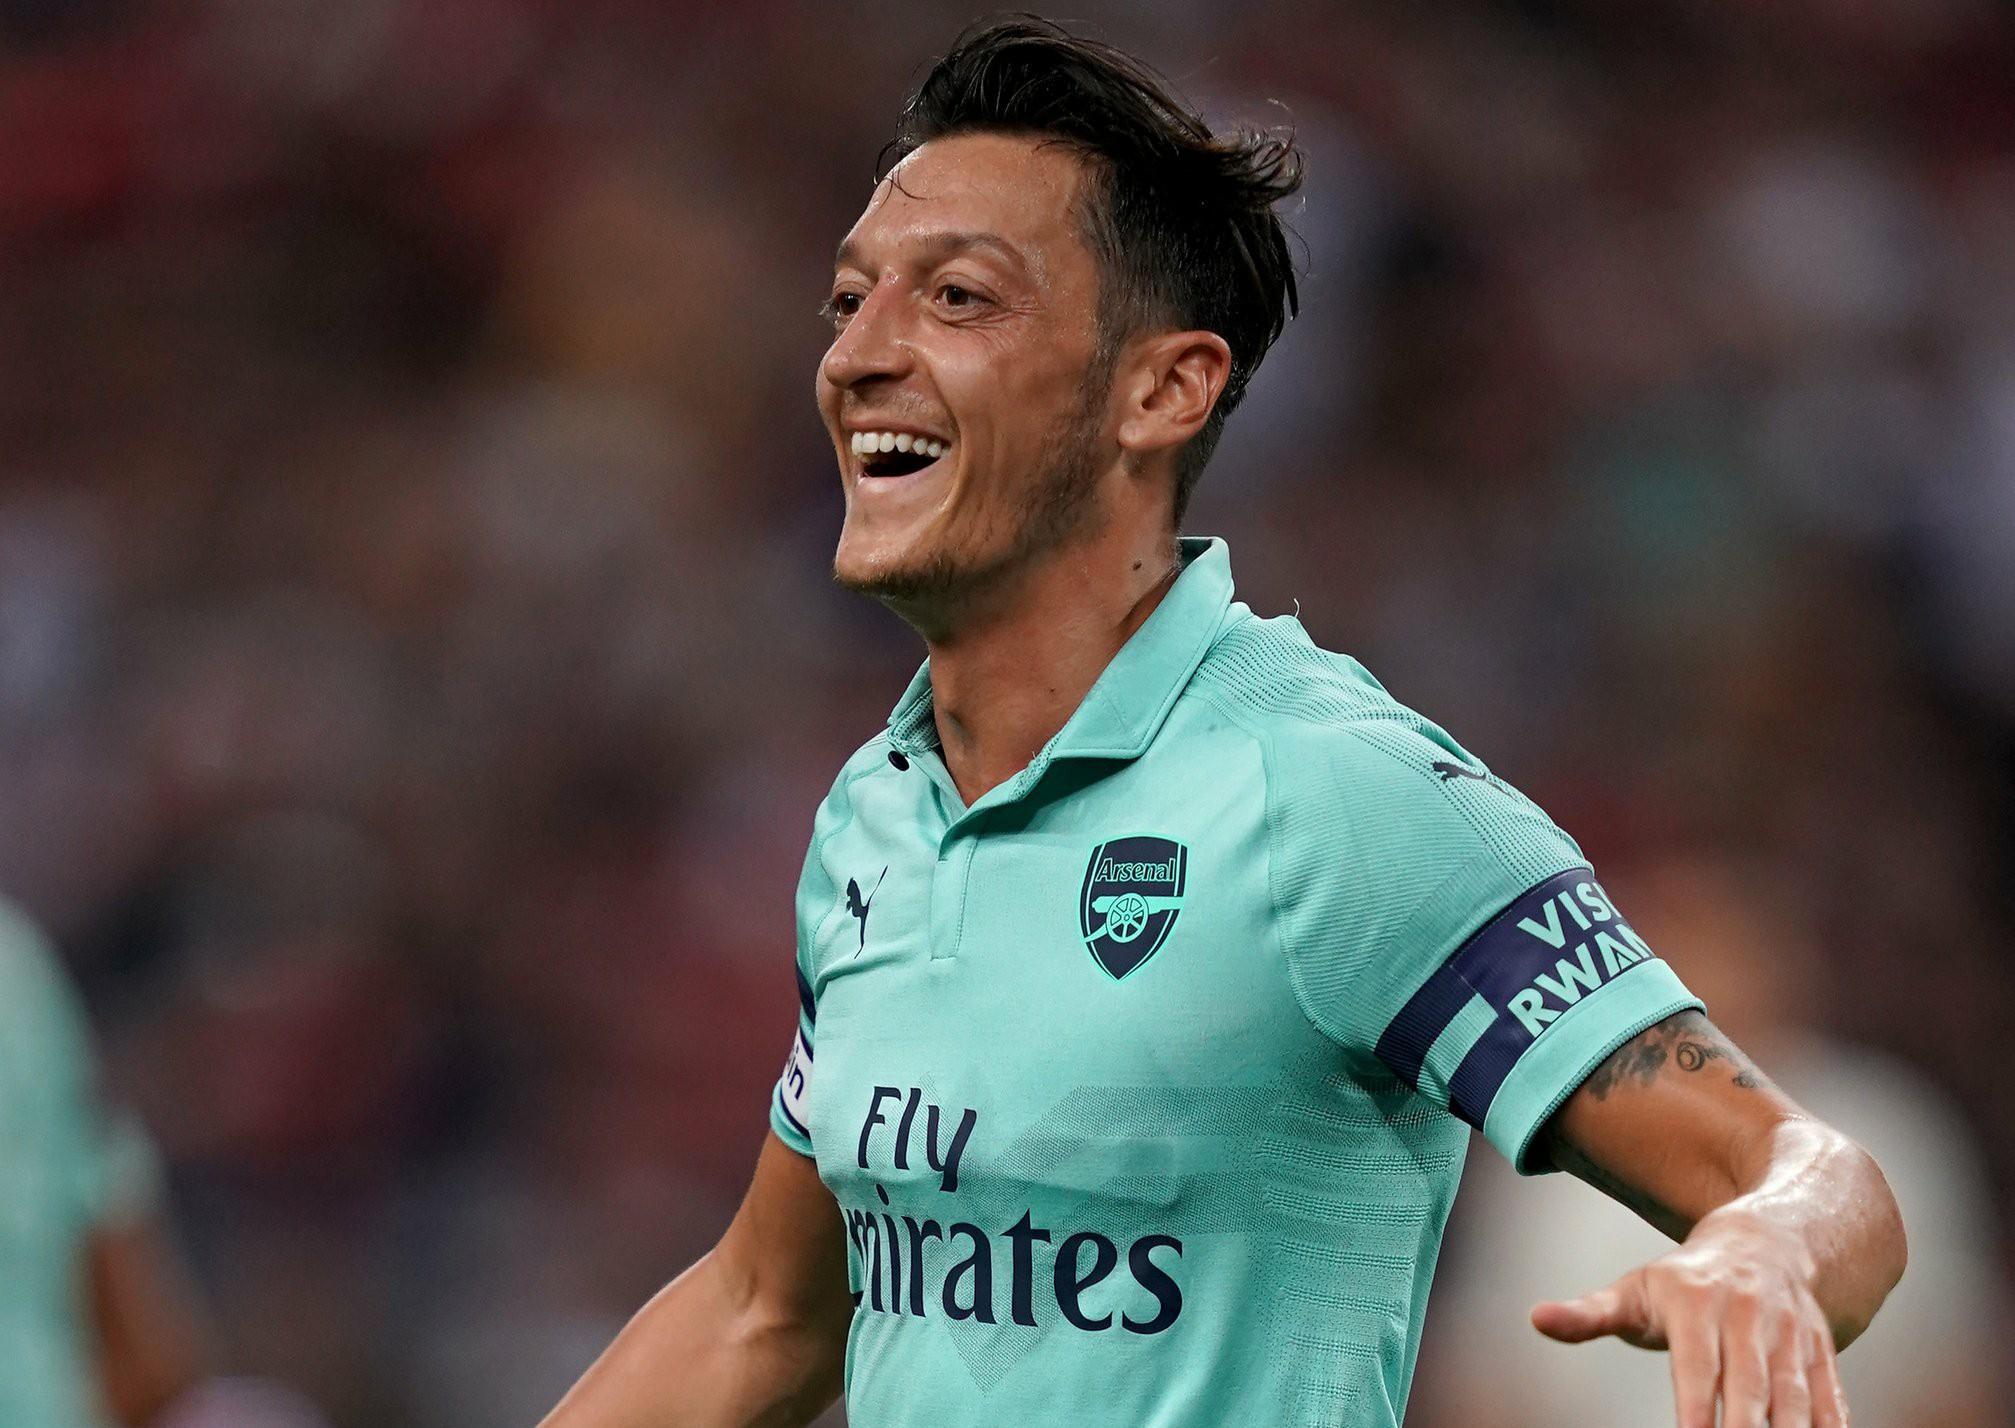 Arsenal midfielder Mesut Ozil in Singapore